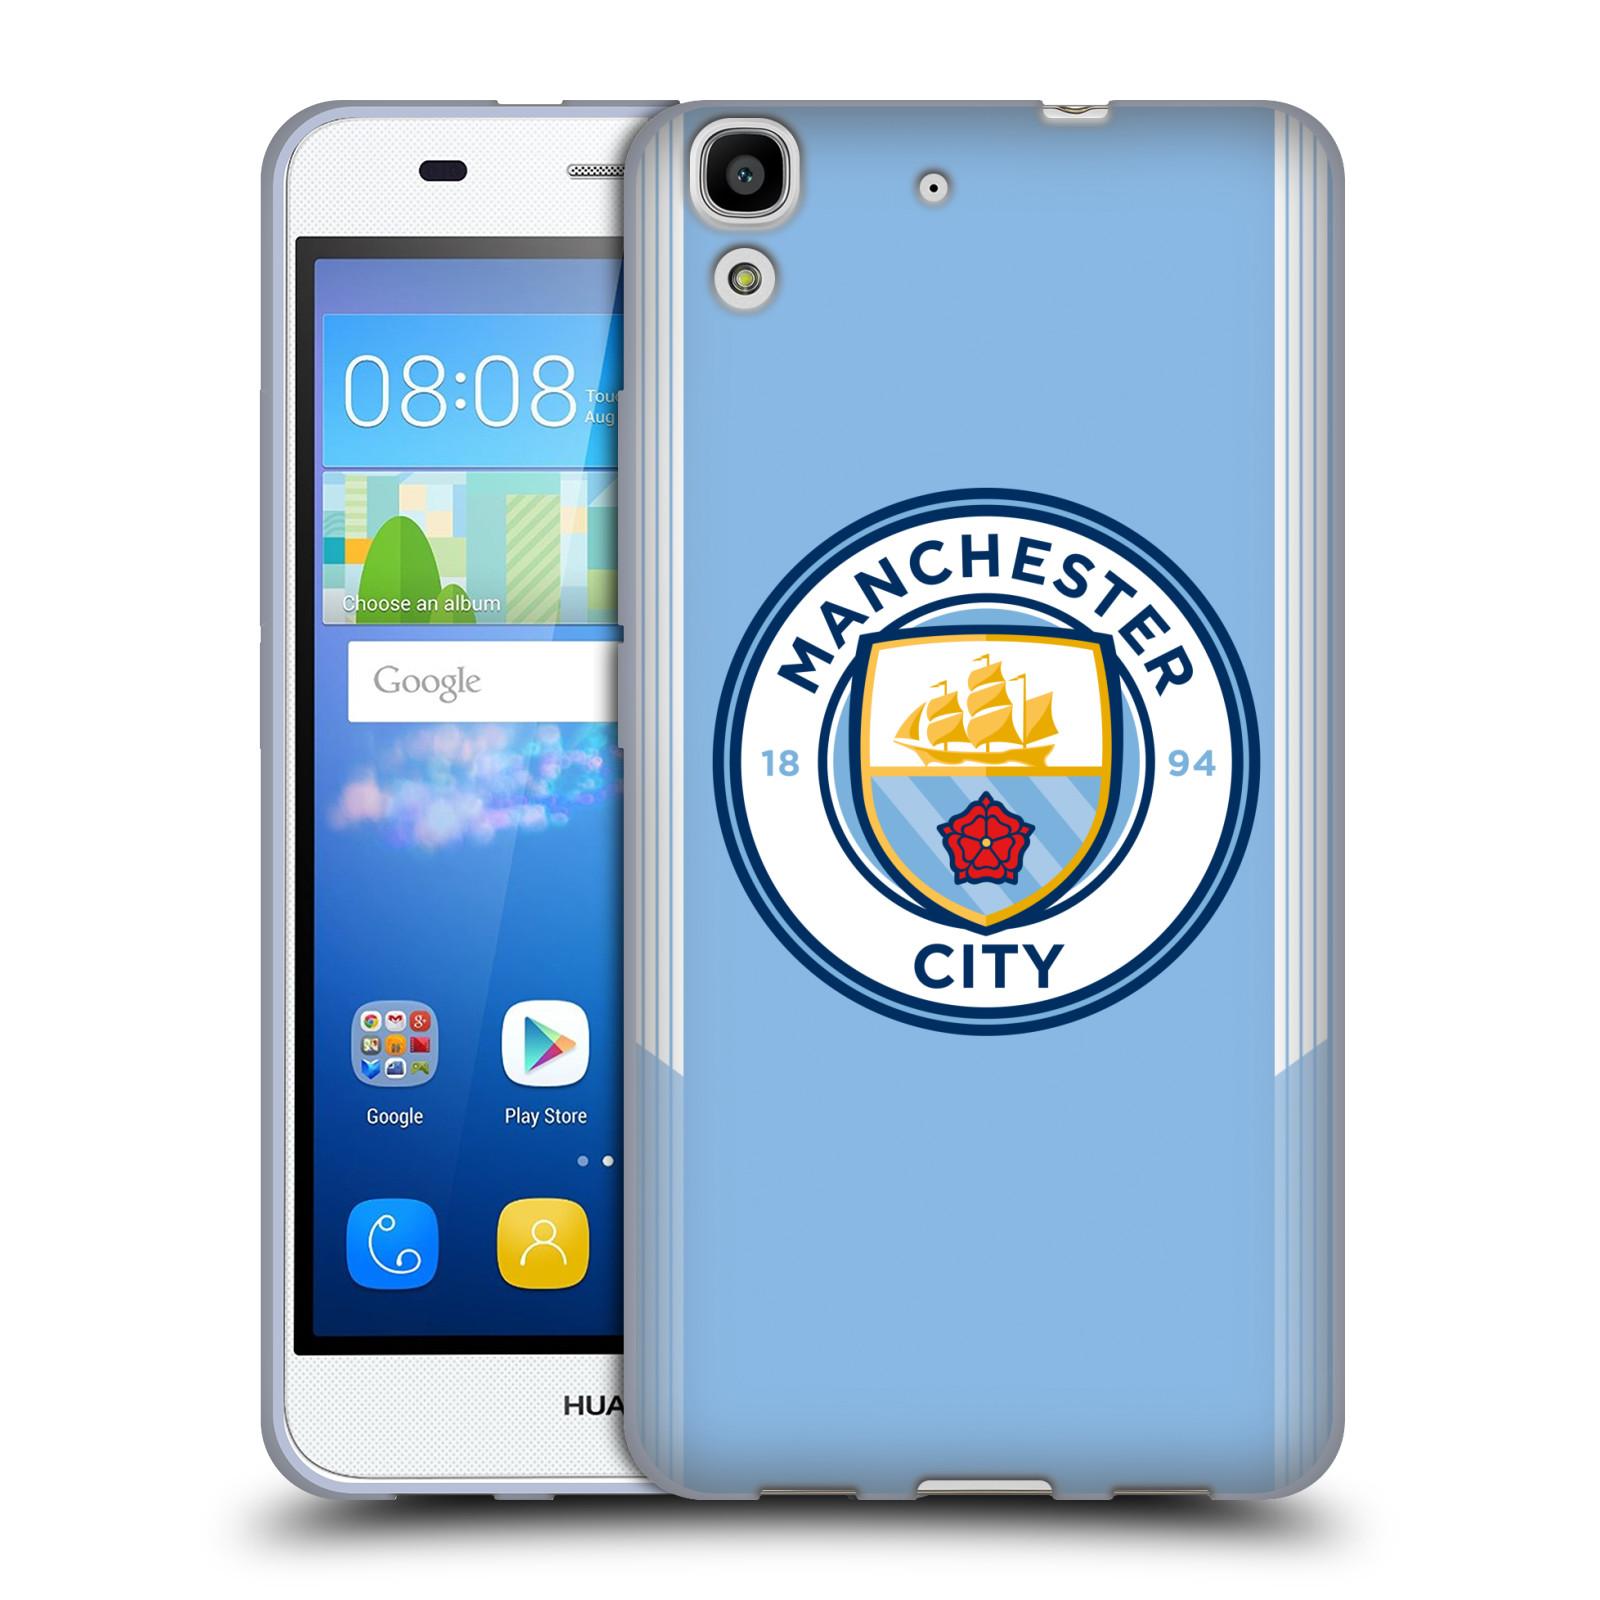 HEAD CASE silikonový obal na mobil Huawei Y6 Fotbalový klub Manchester City  modrá barva domácí dresy a686d54327c